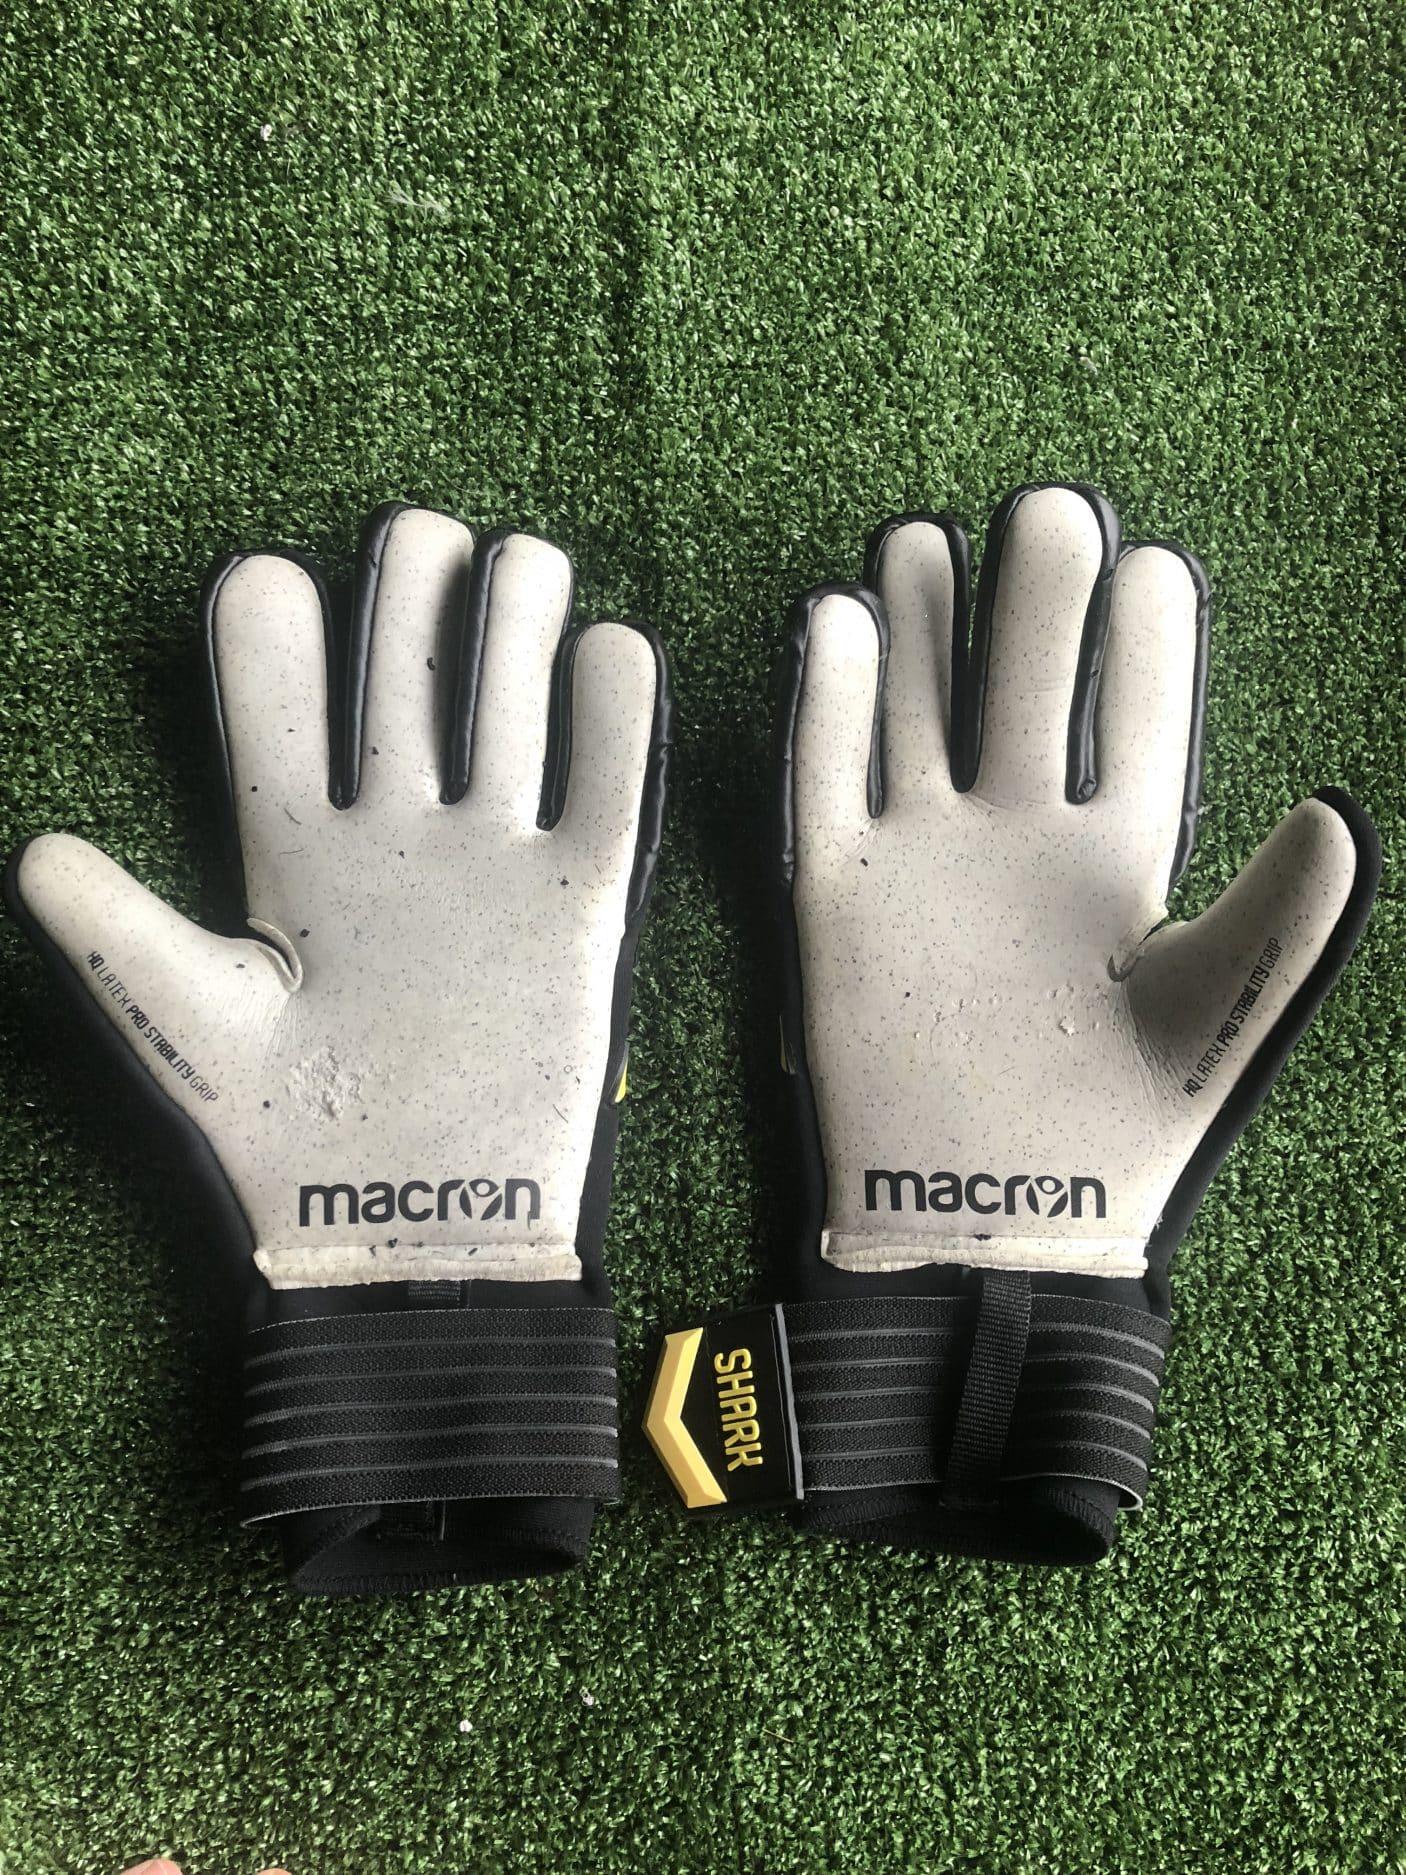 test-gants-gardien-Macron-Shark-XF-img18